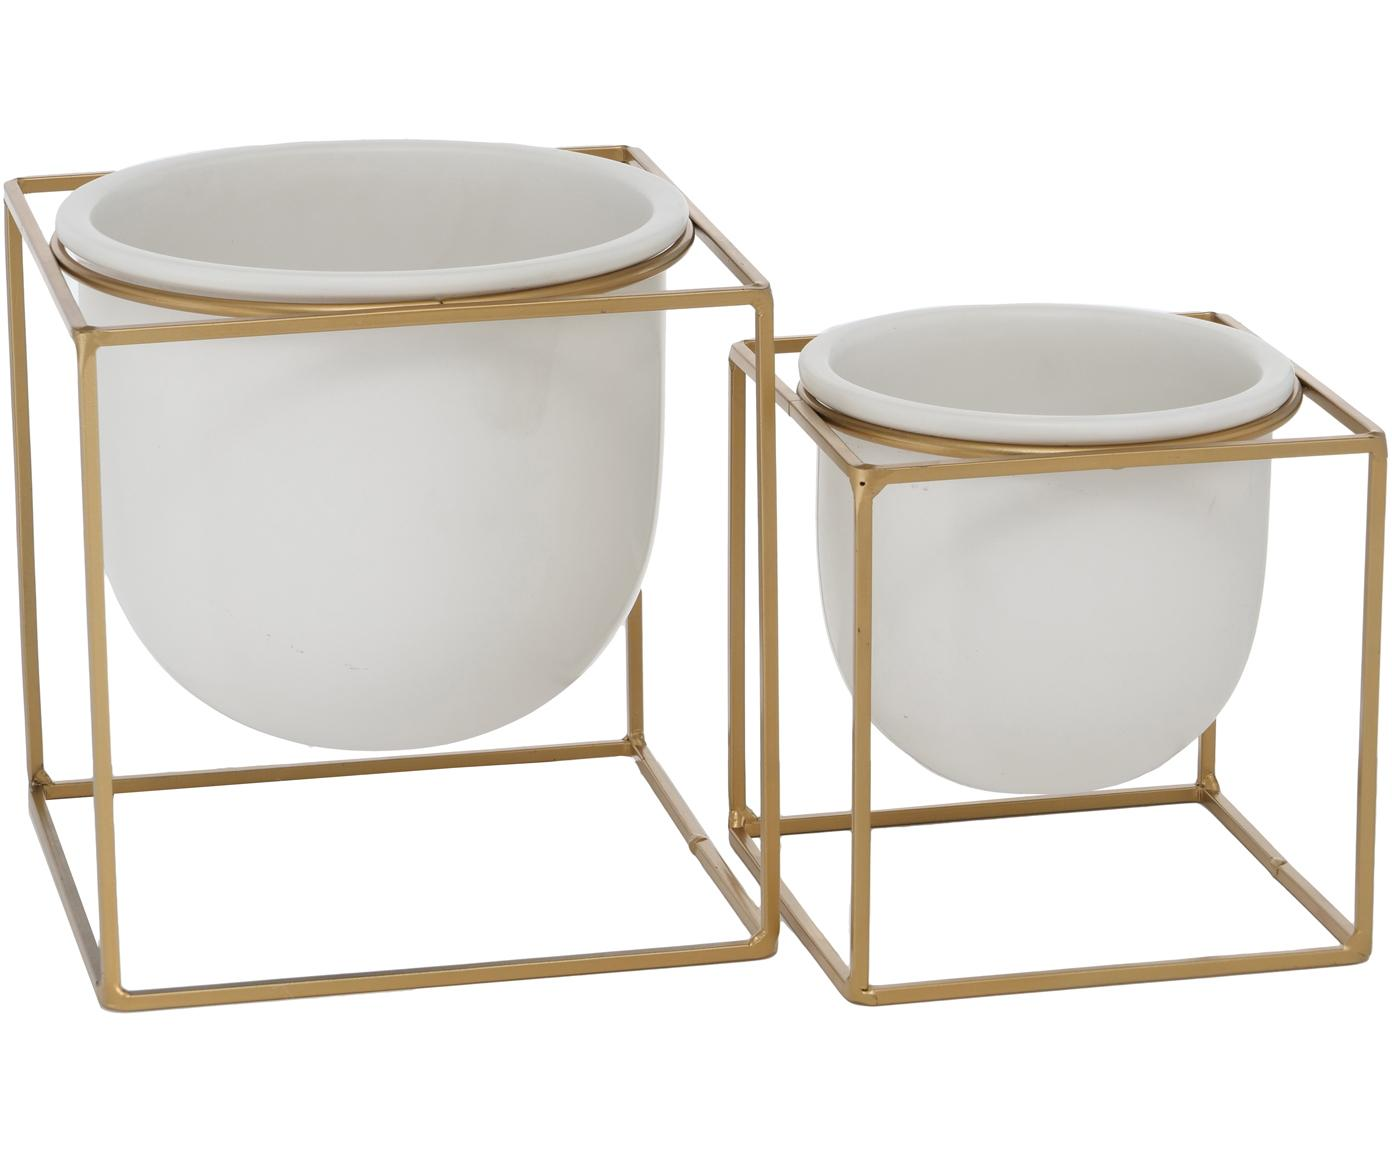 Übertopf-Set Kumbo aus Metall, 2-tlg., Metall, Weiß, Sondergrößen